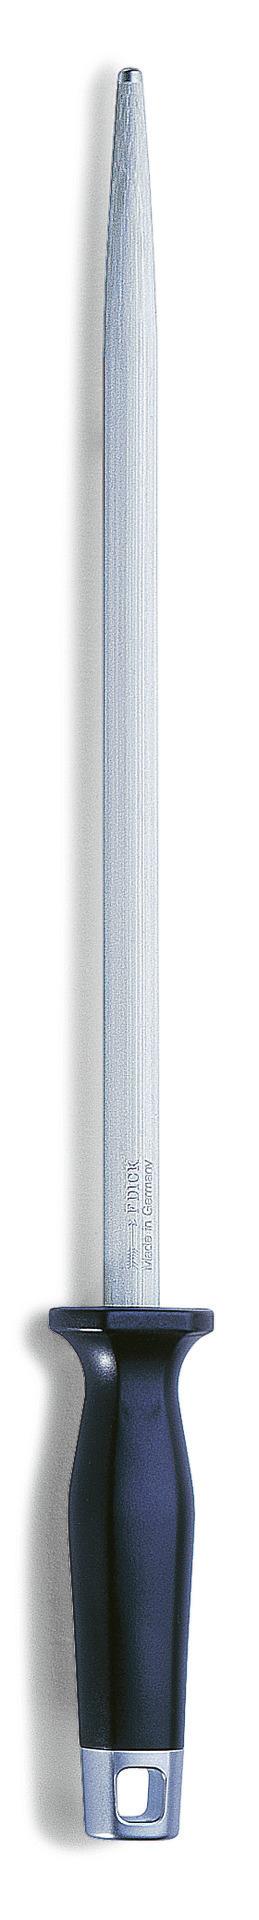 Koch-Wetzstahl oval Klingenlänge 300 mm Standardzug